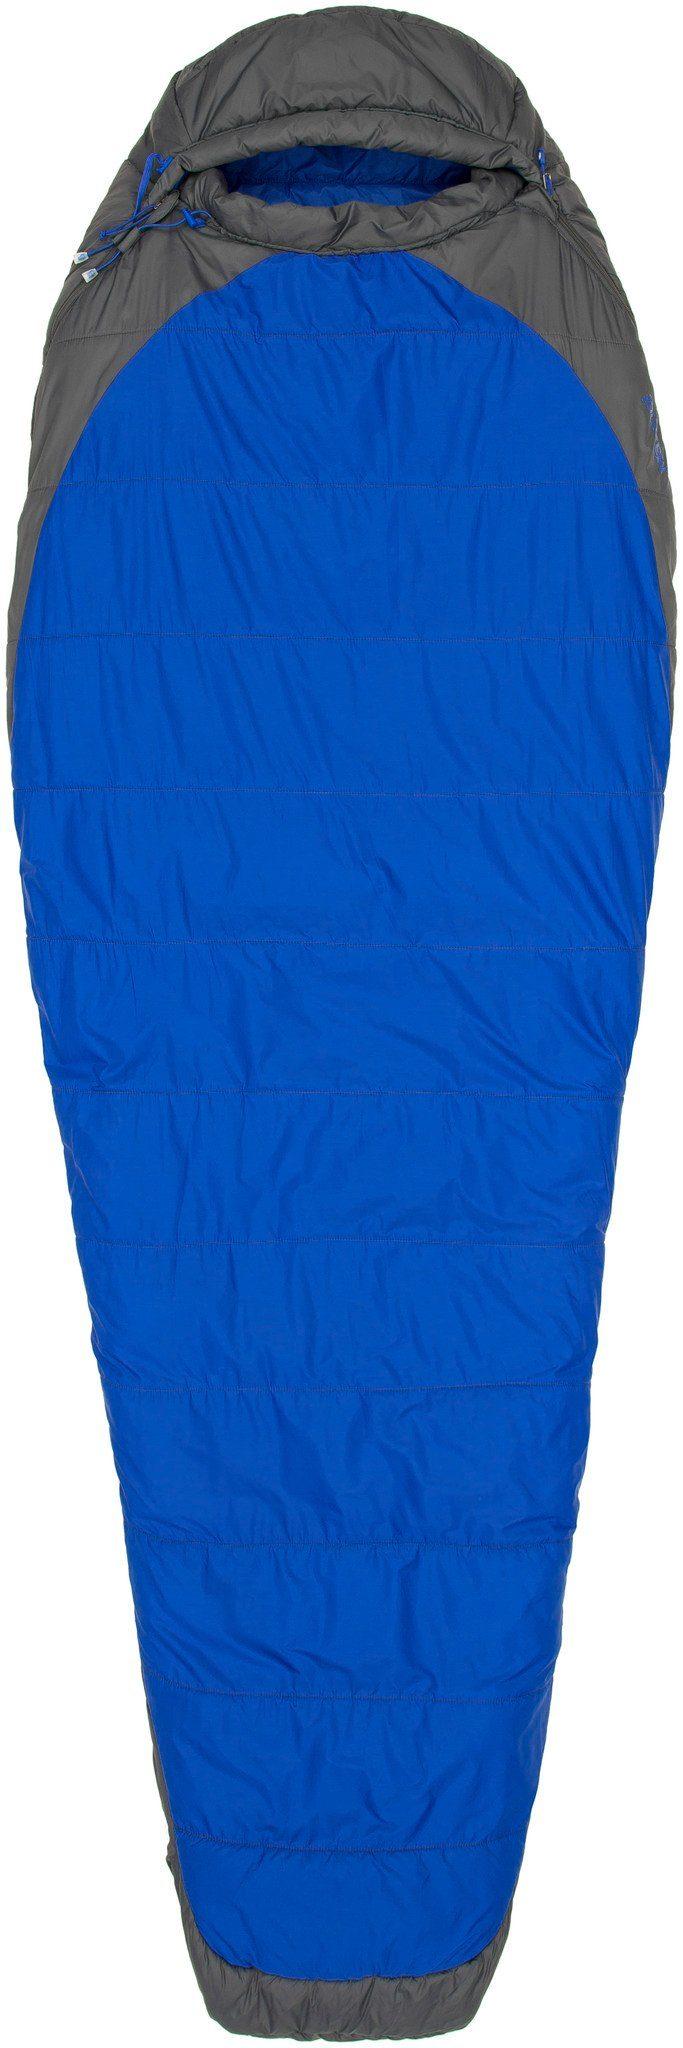 Marmot Schlafsack »Trestles Elite 15 Sleeping Bag Long«